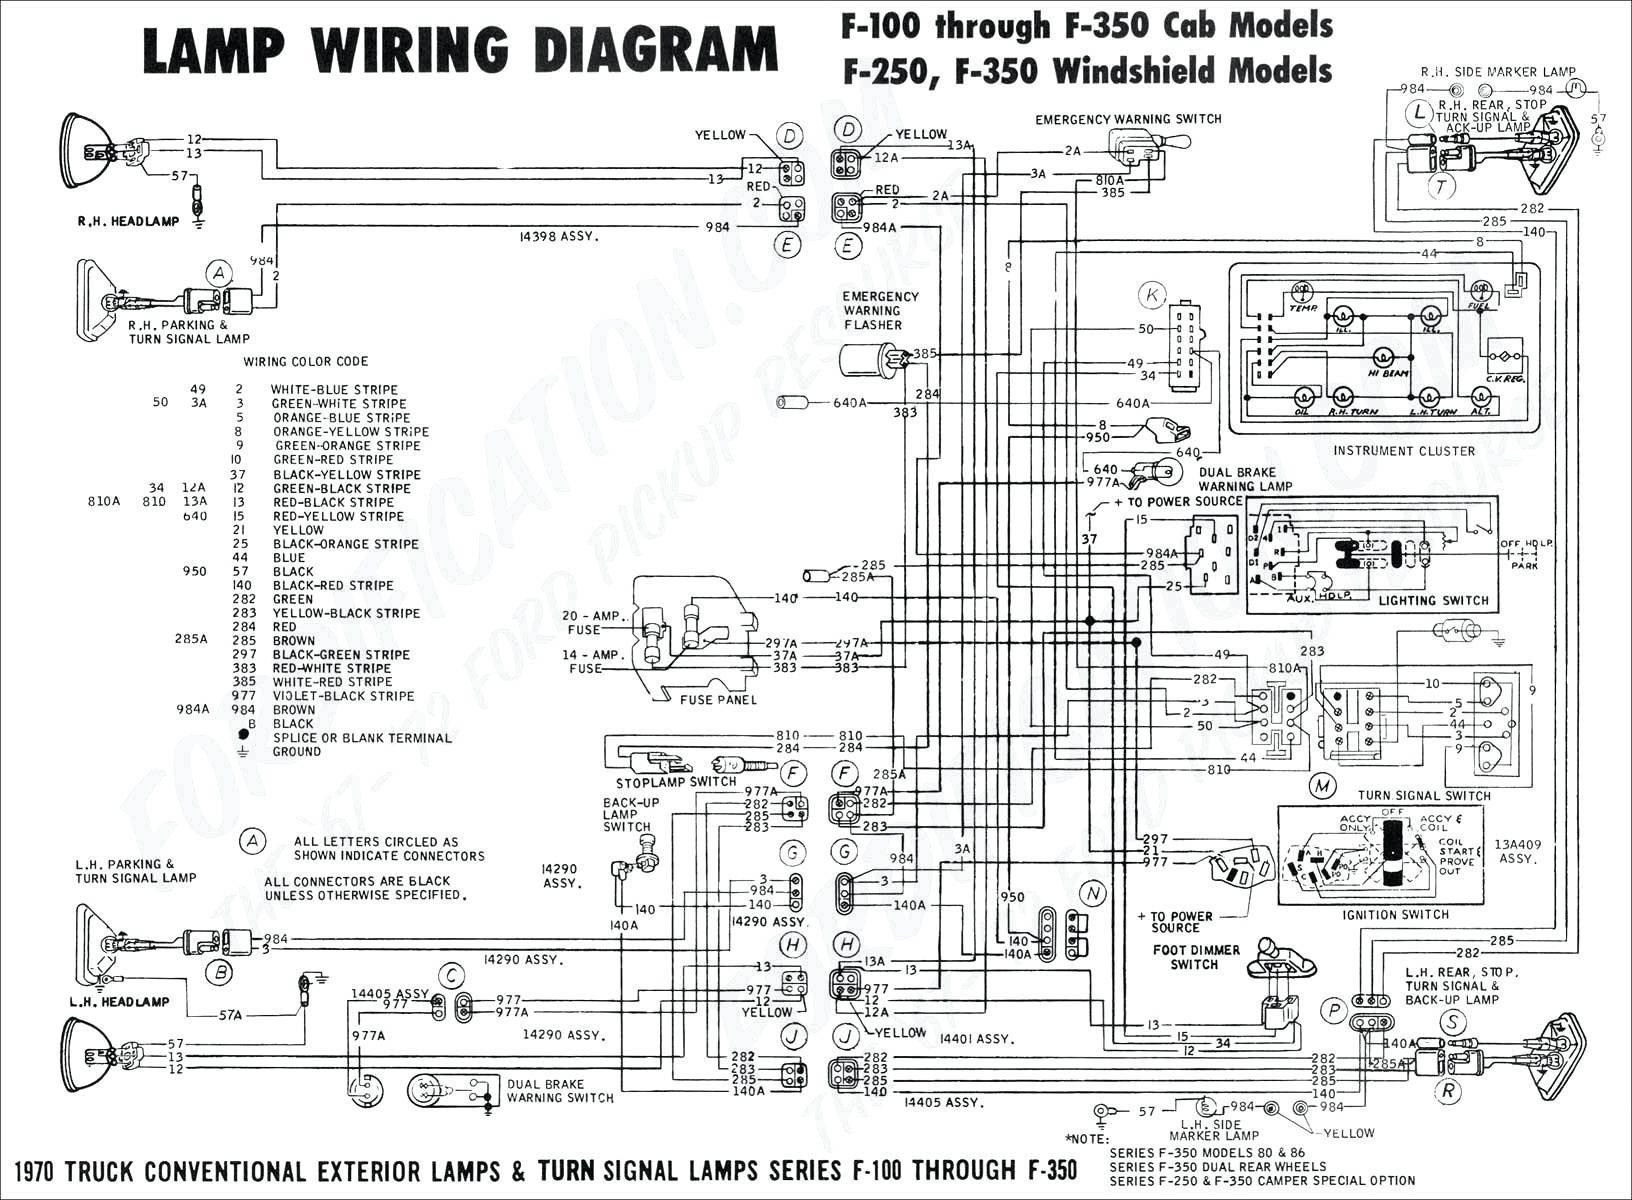 2007 dodge caliber ac wiring diagram s13 fuse image